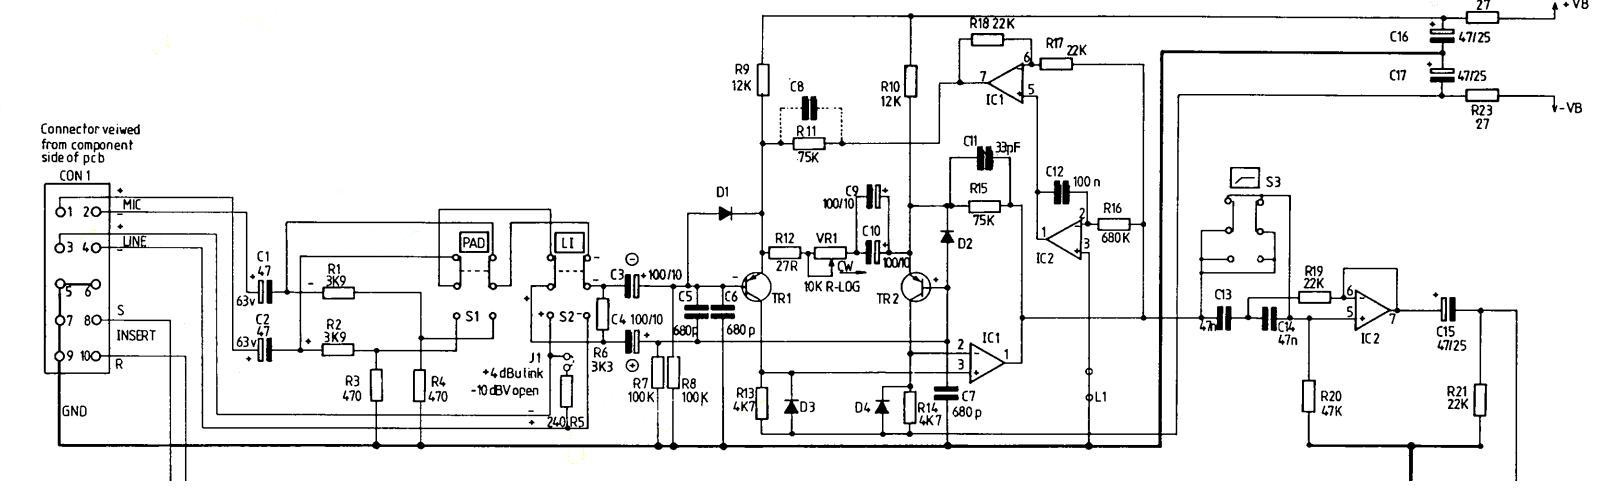 Tl072cp Gearslutz 5532 Ic Mic Preamplifire Circuit 200binput